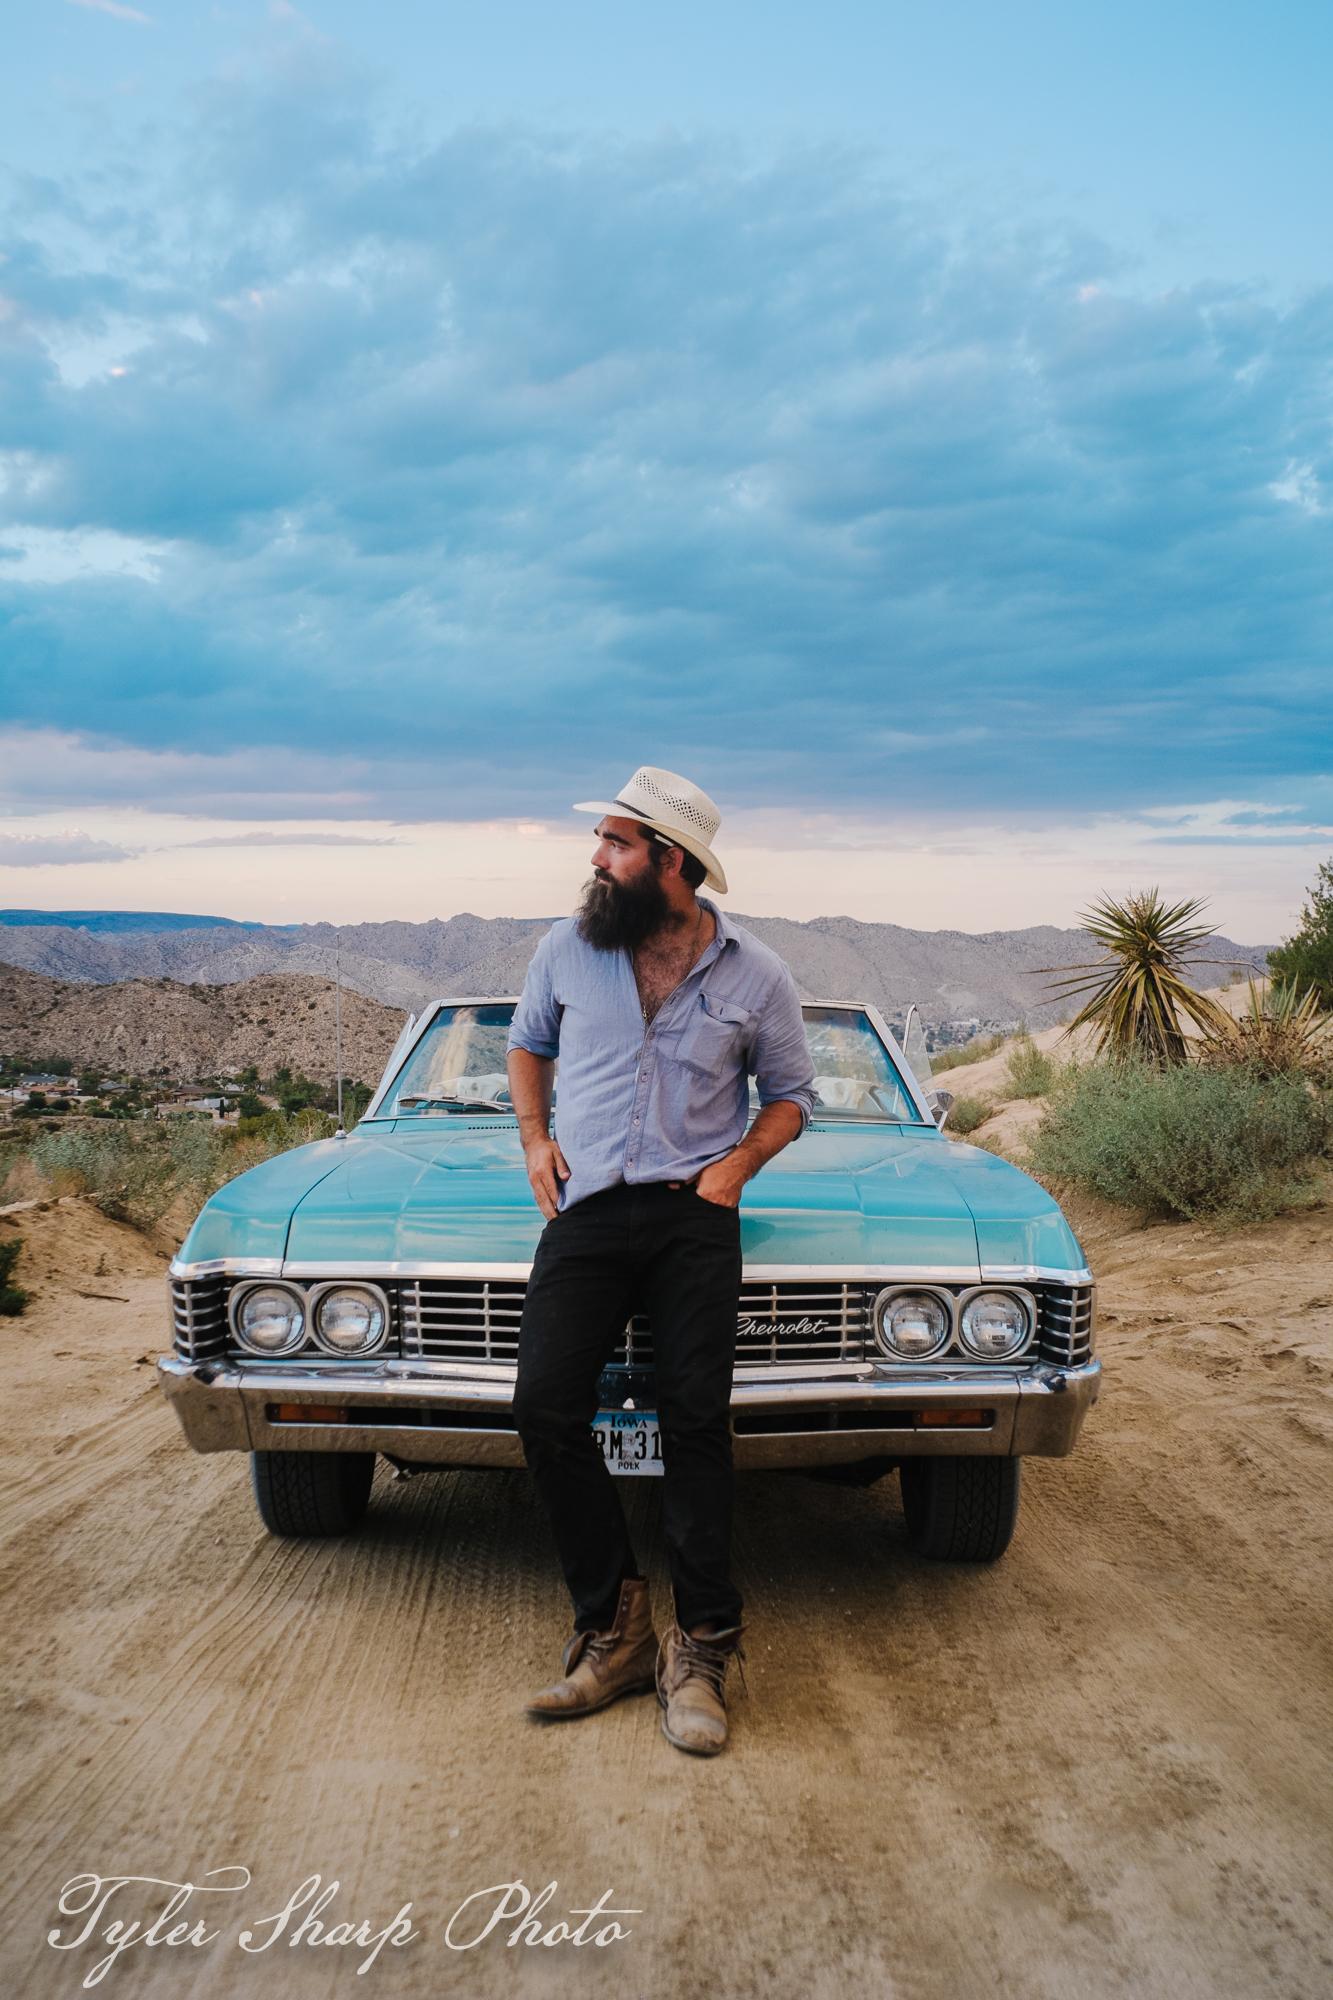 Garrett Cornelison and his 67' Chevy Impala.